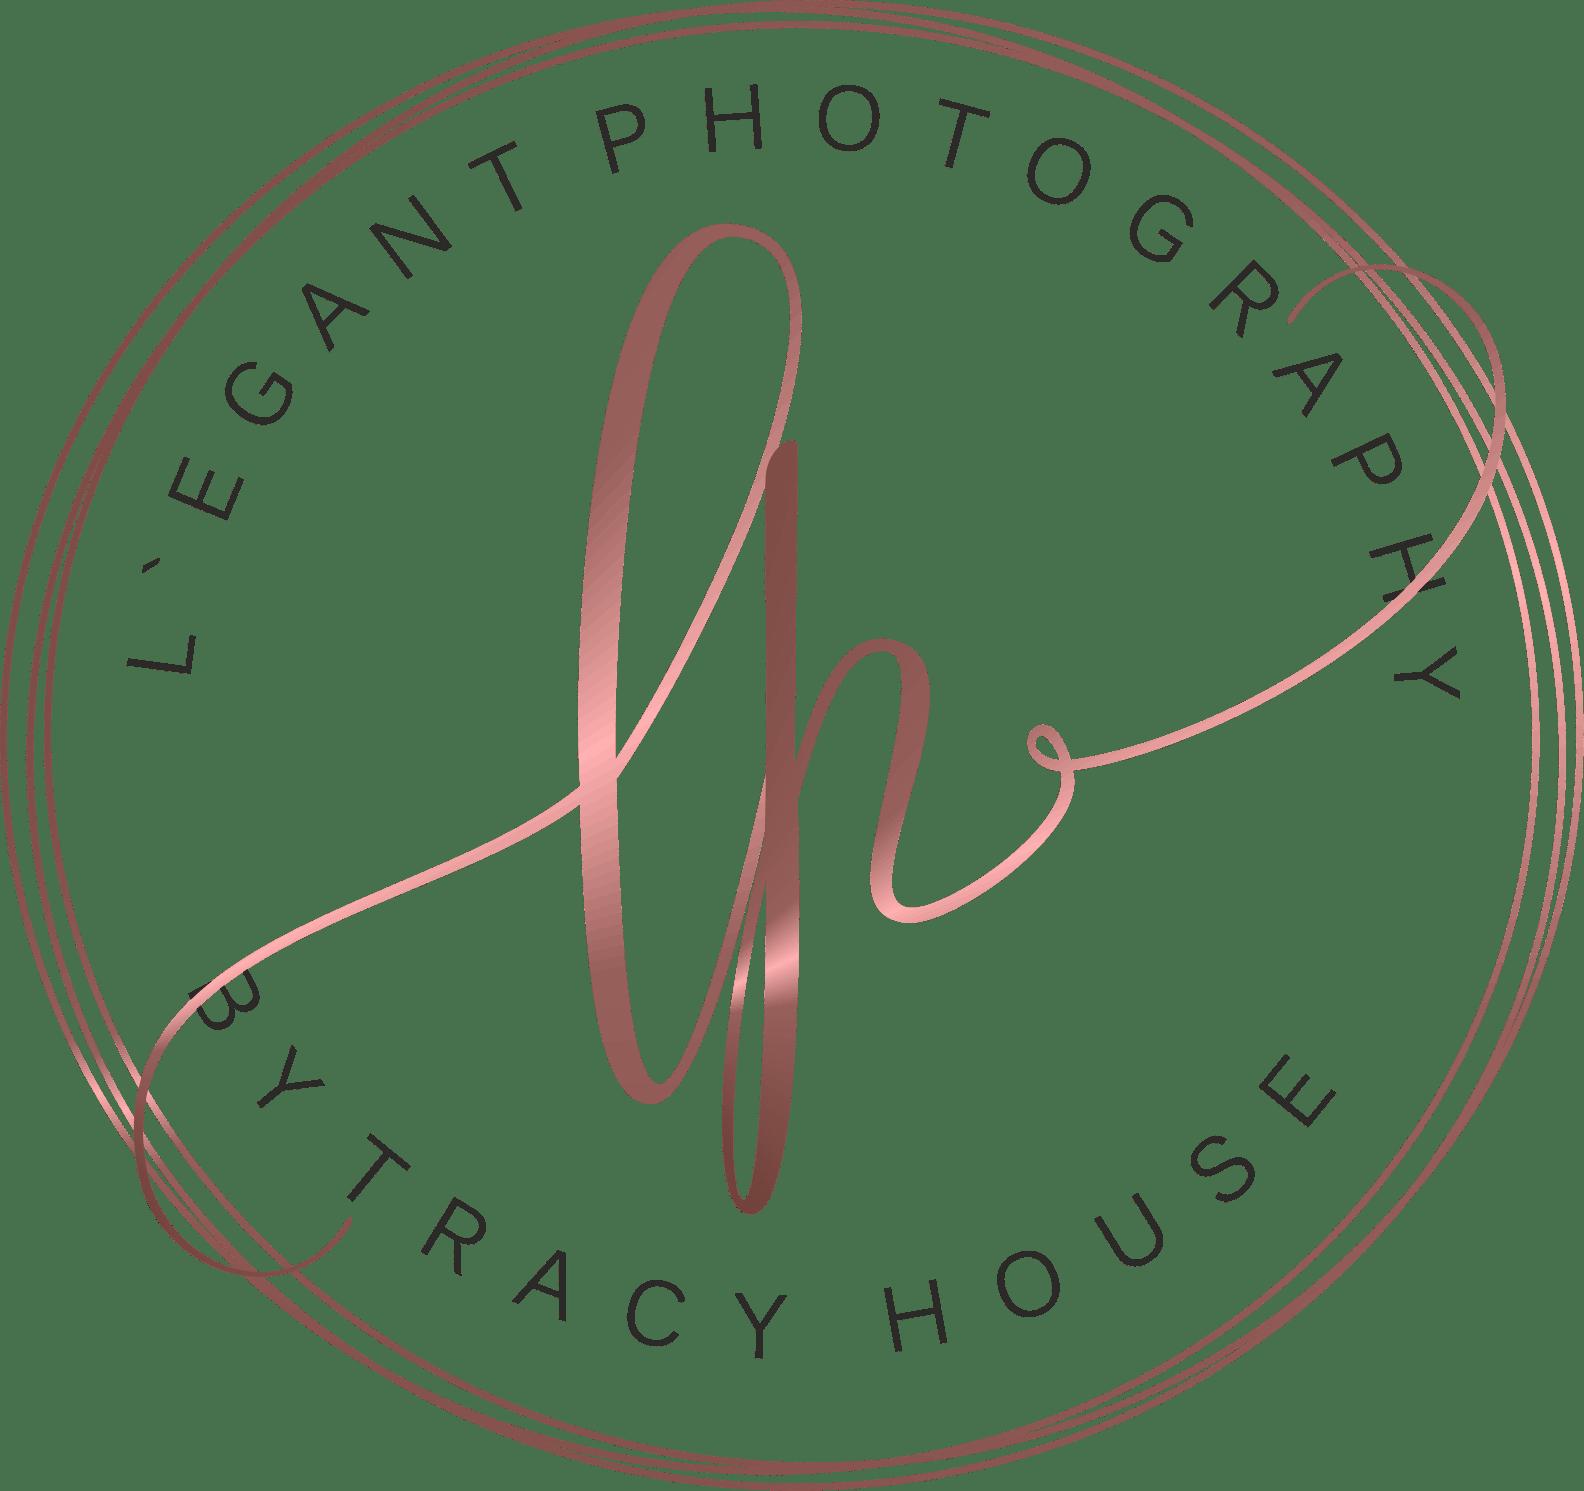 L'egant Photography